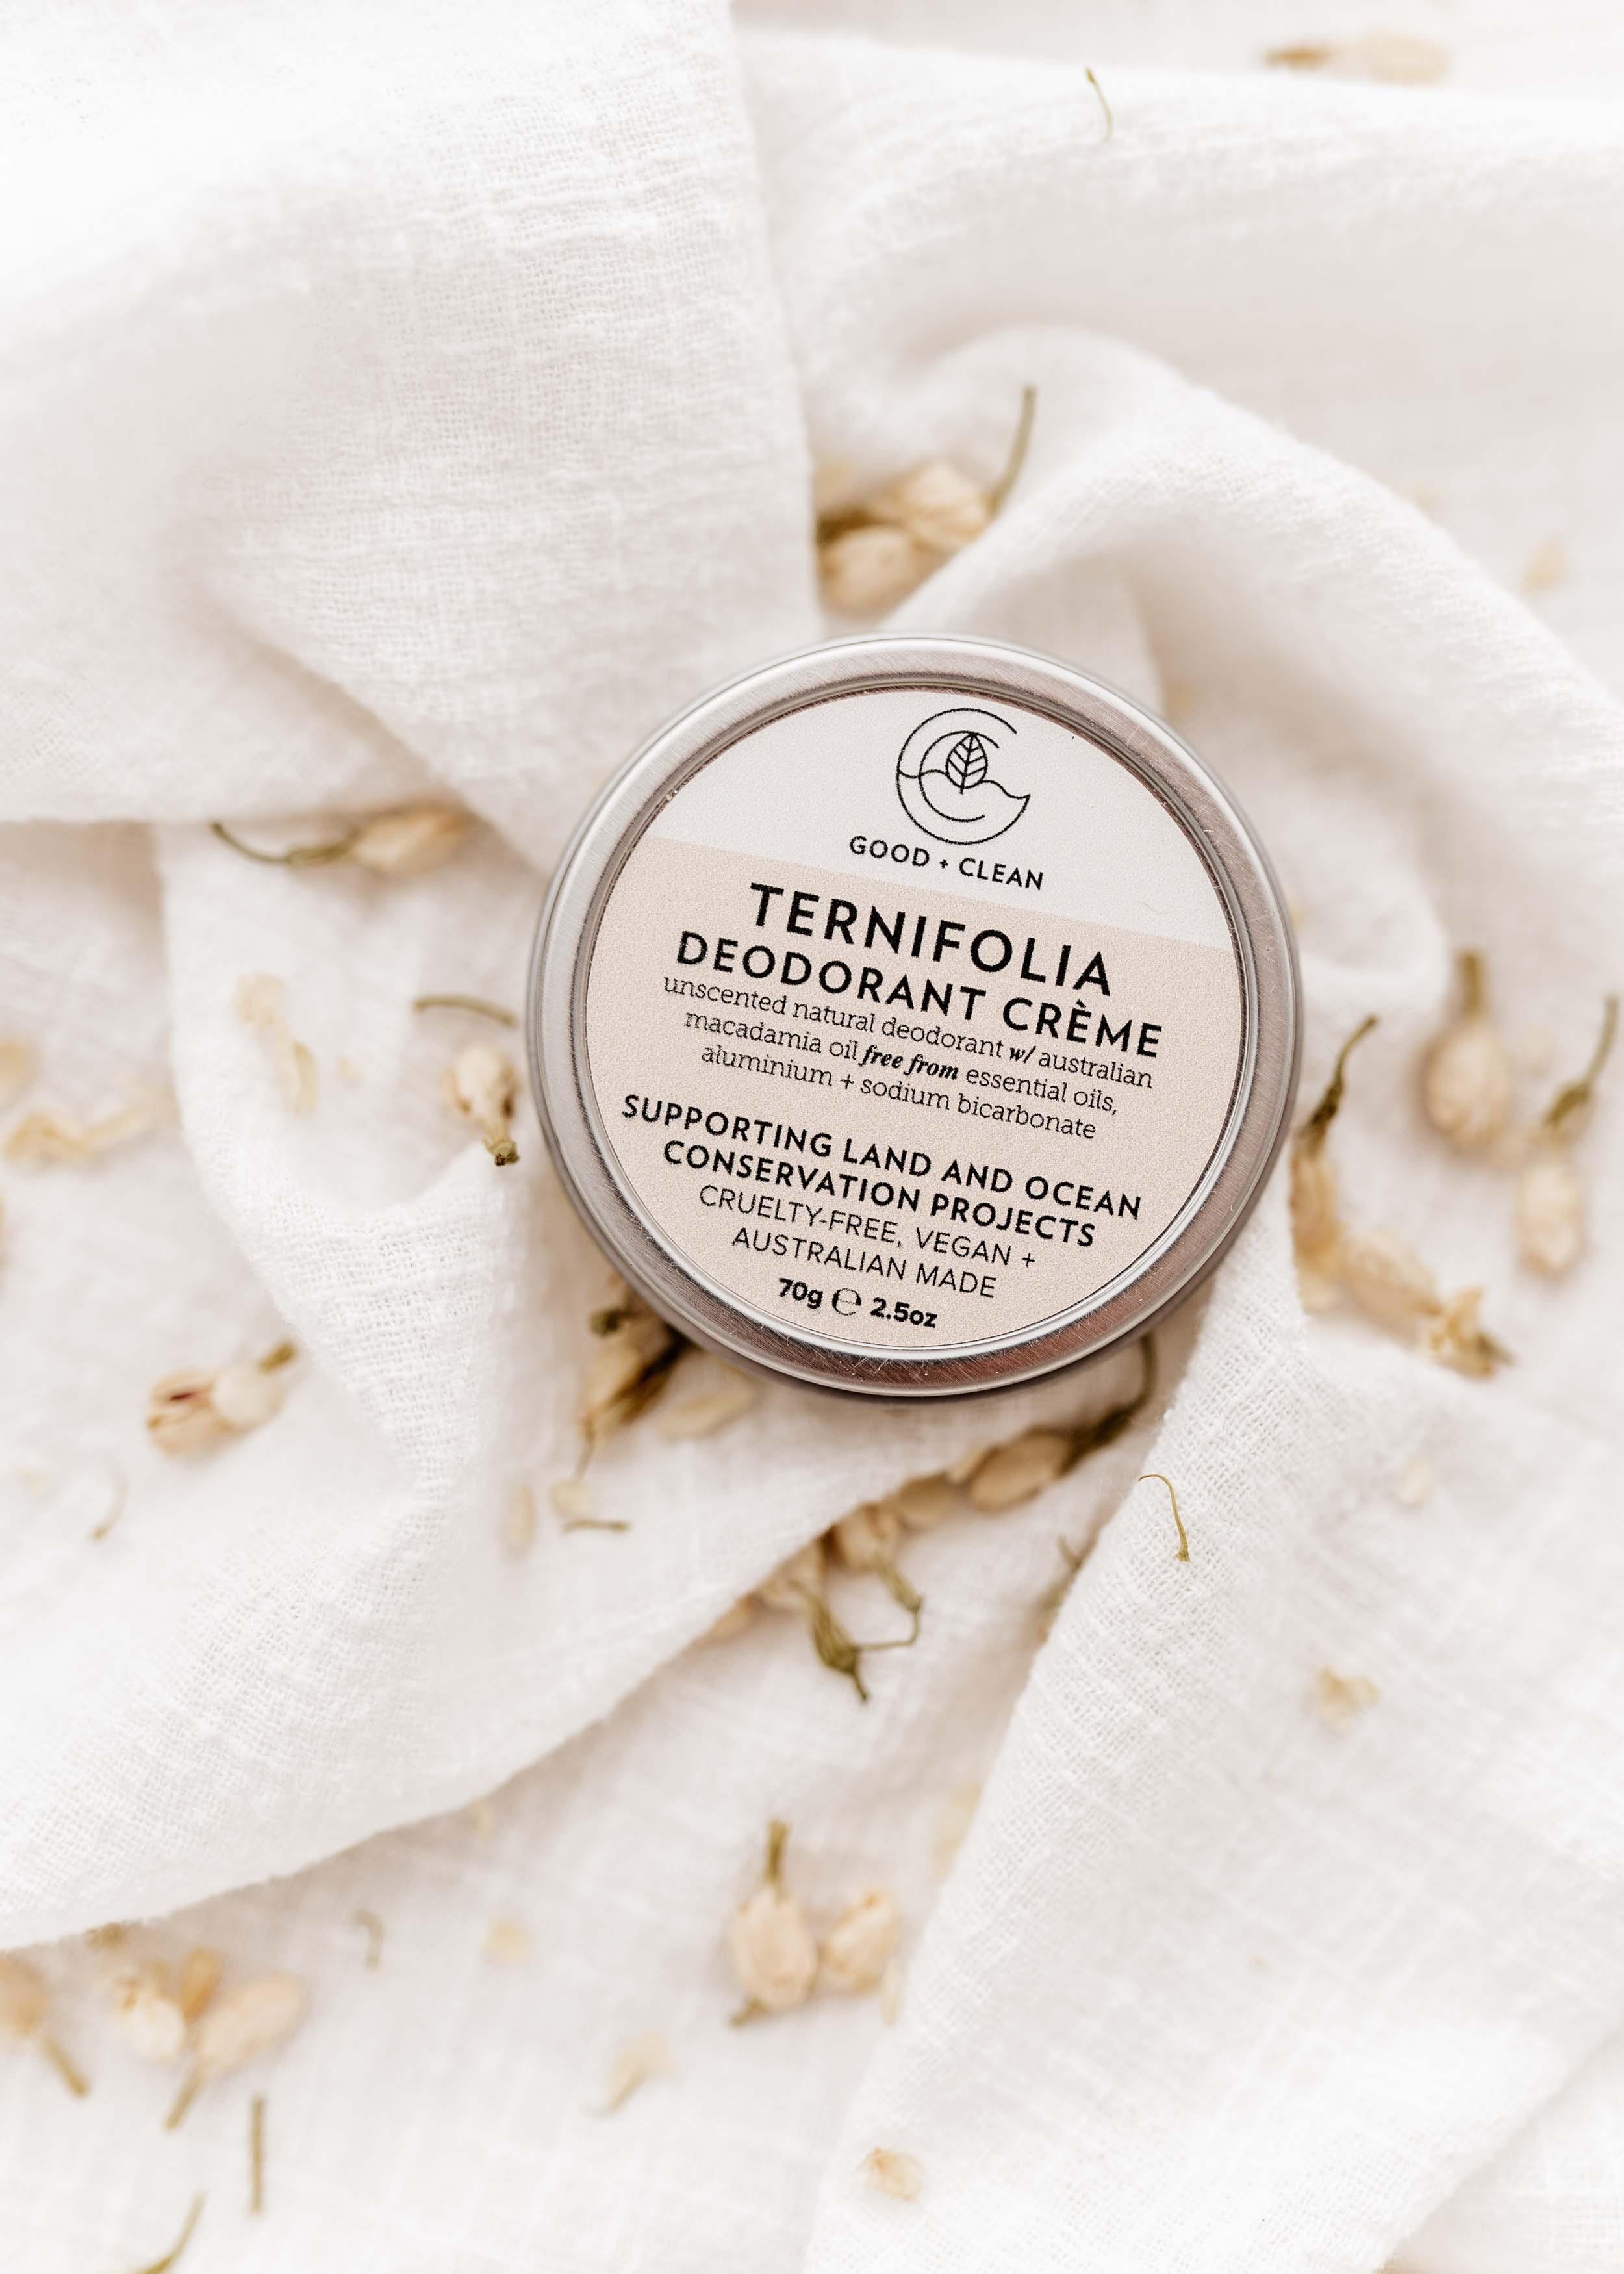 keira-mason-good-and-clean-deodorant-ternifola.jpg